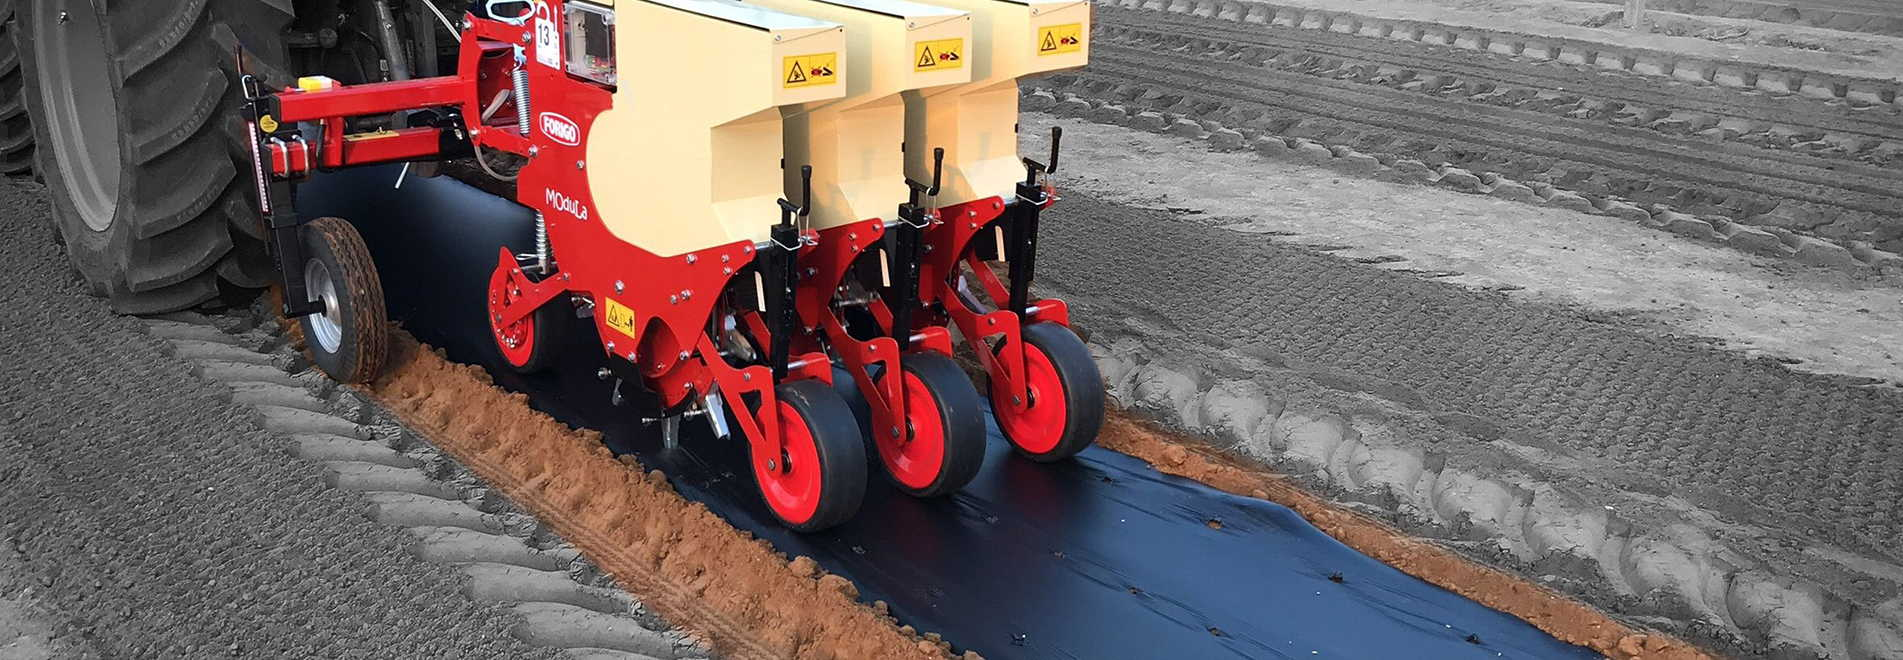 Macchine agricole 07